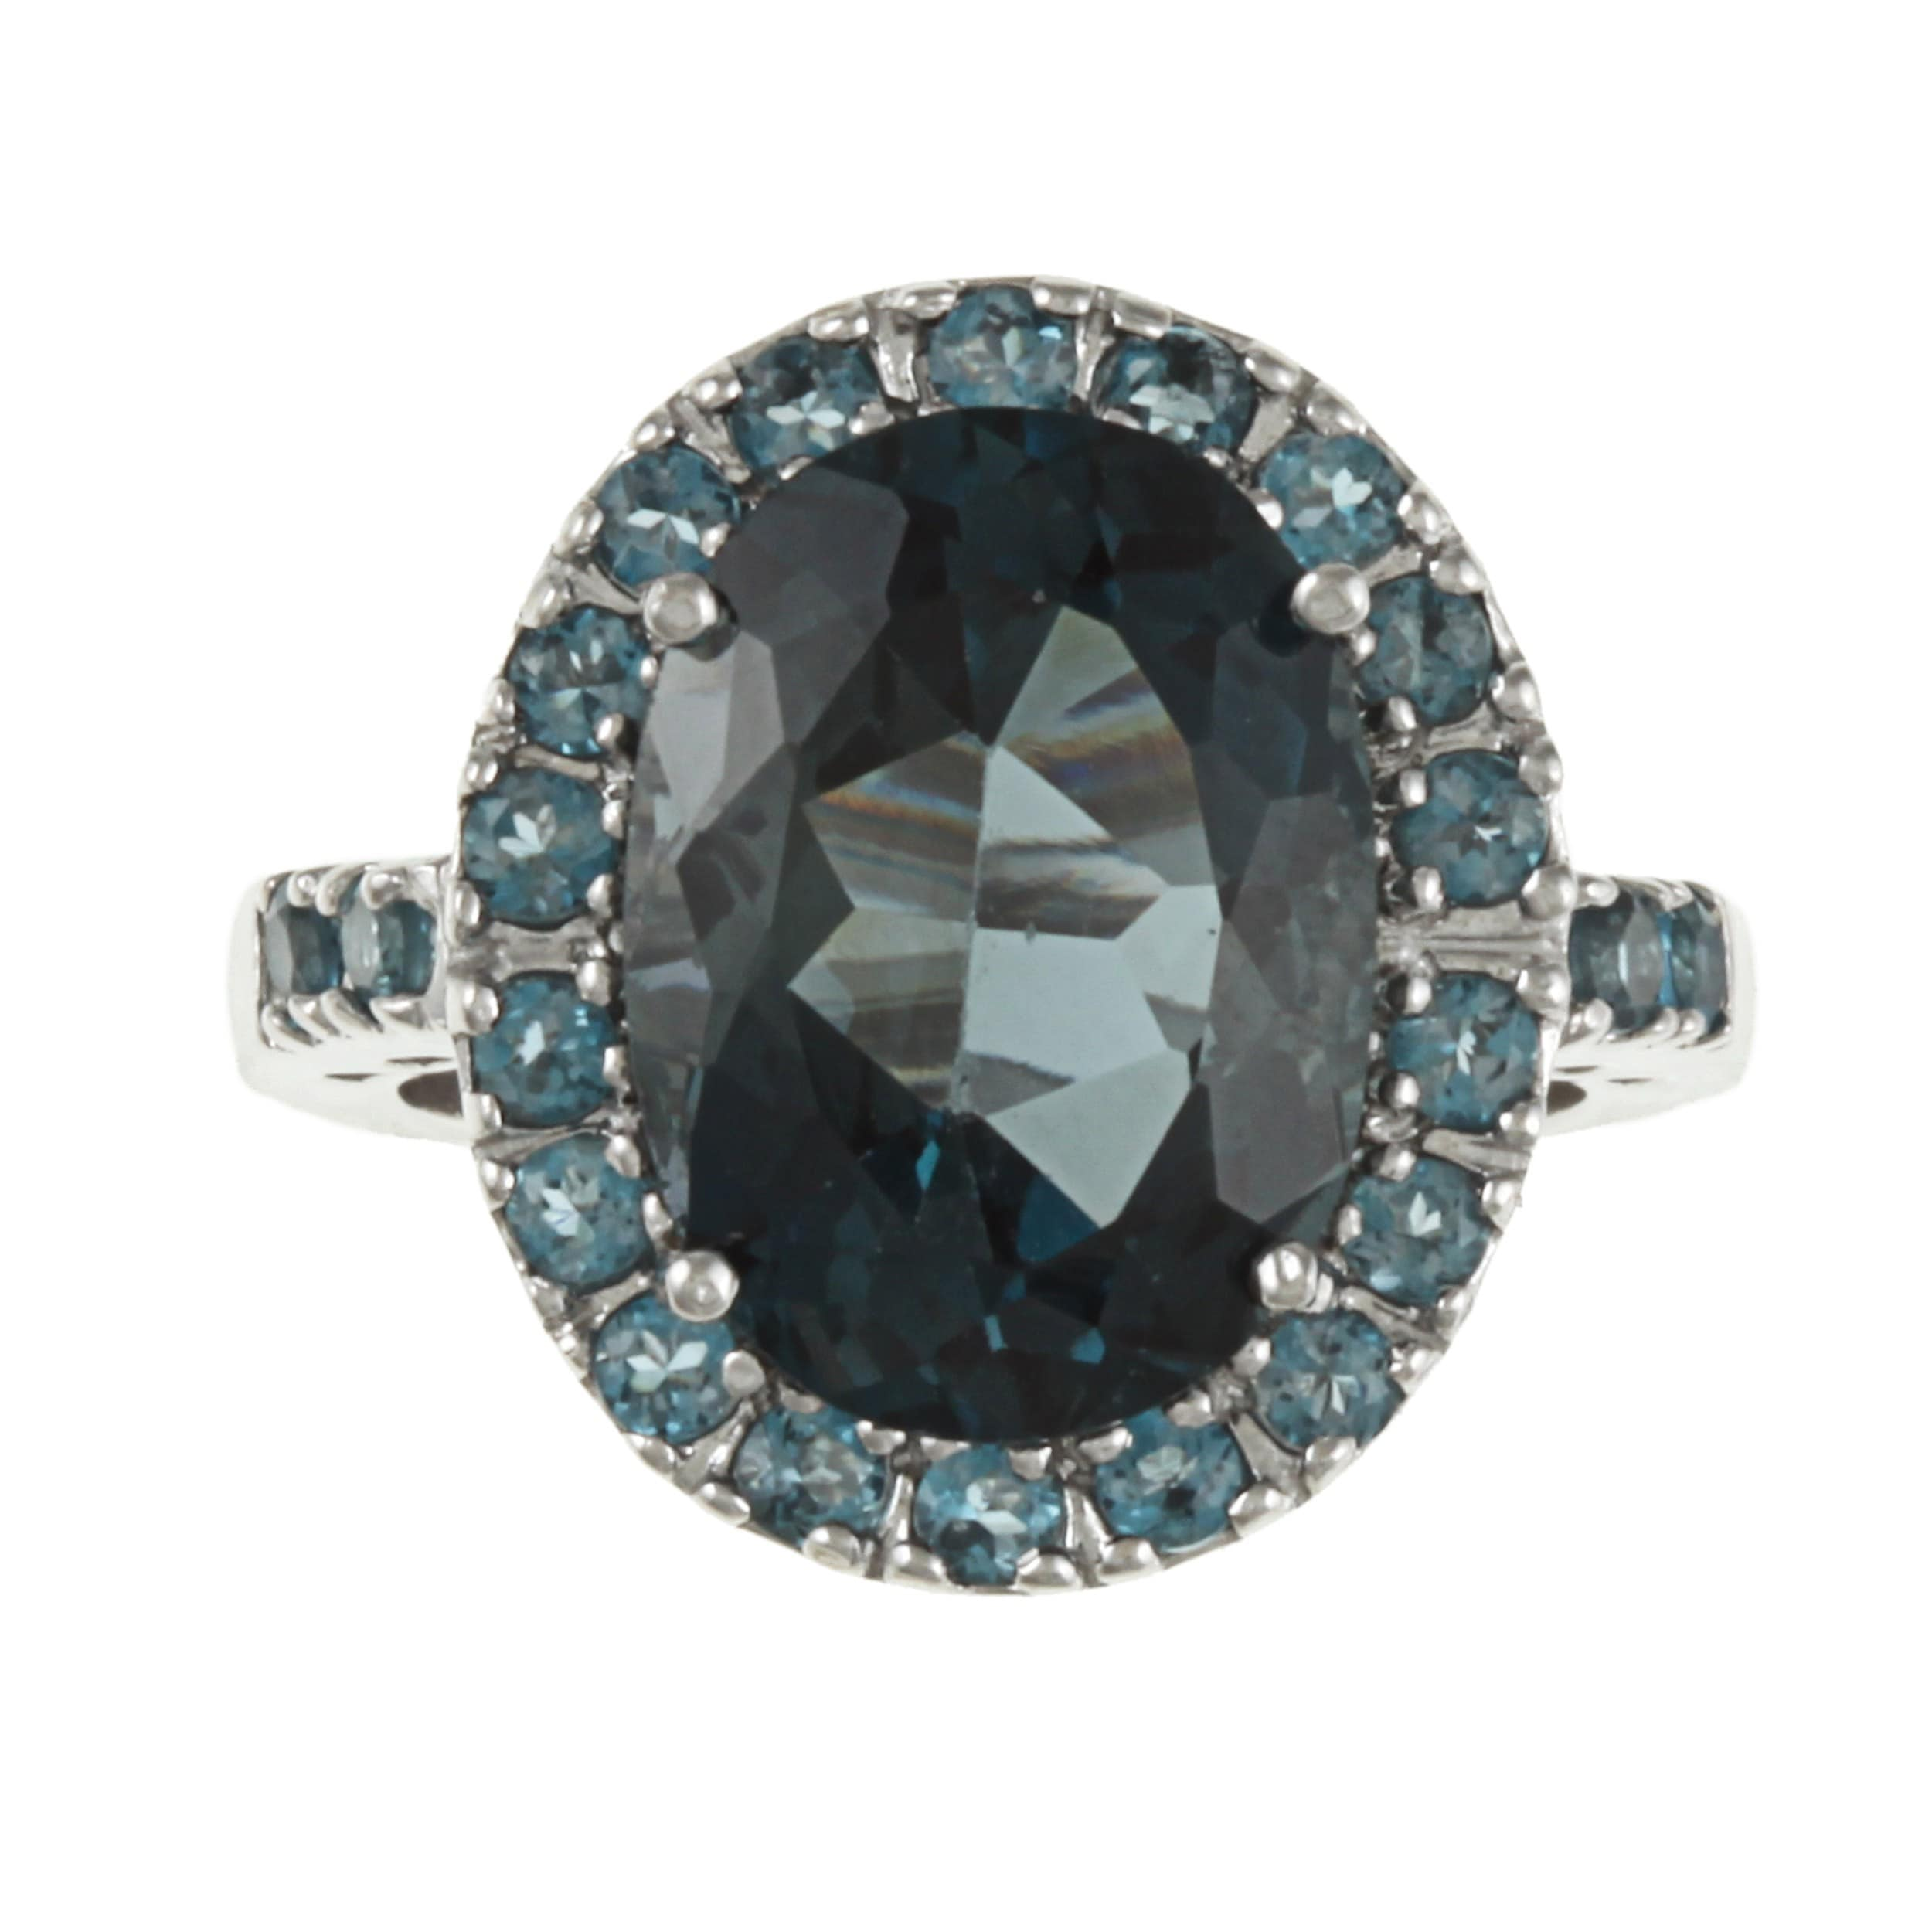 Blue Topaz Quartz Silver Plated 18 Grams Earring 1.75 Handmade Jewellry Awesome